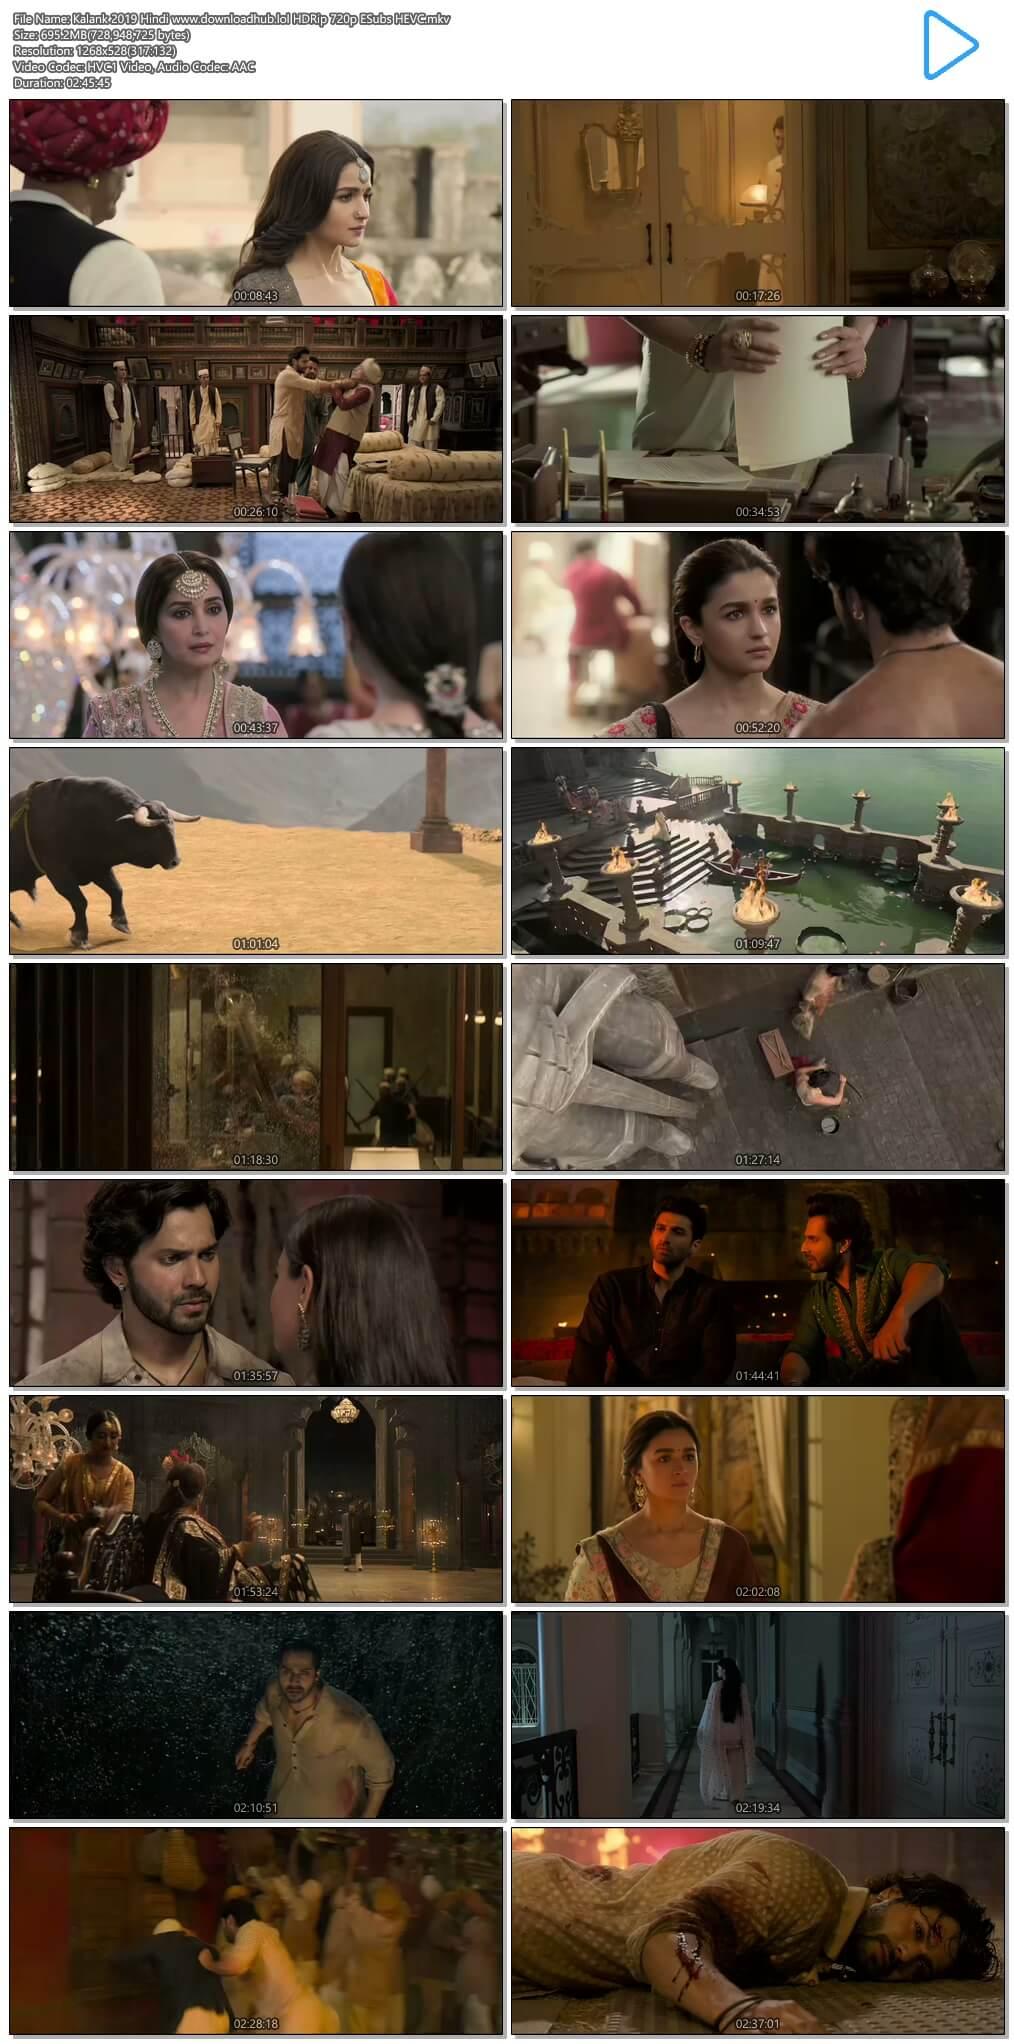 Kalank 2019 Hindi 700MB HDRip 720p ESubs HEVC